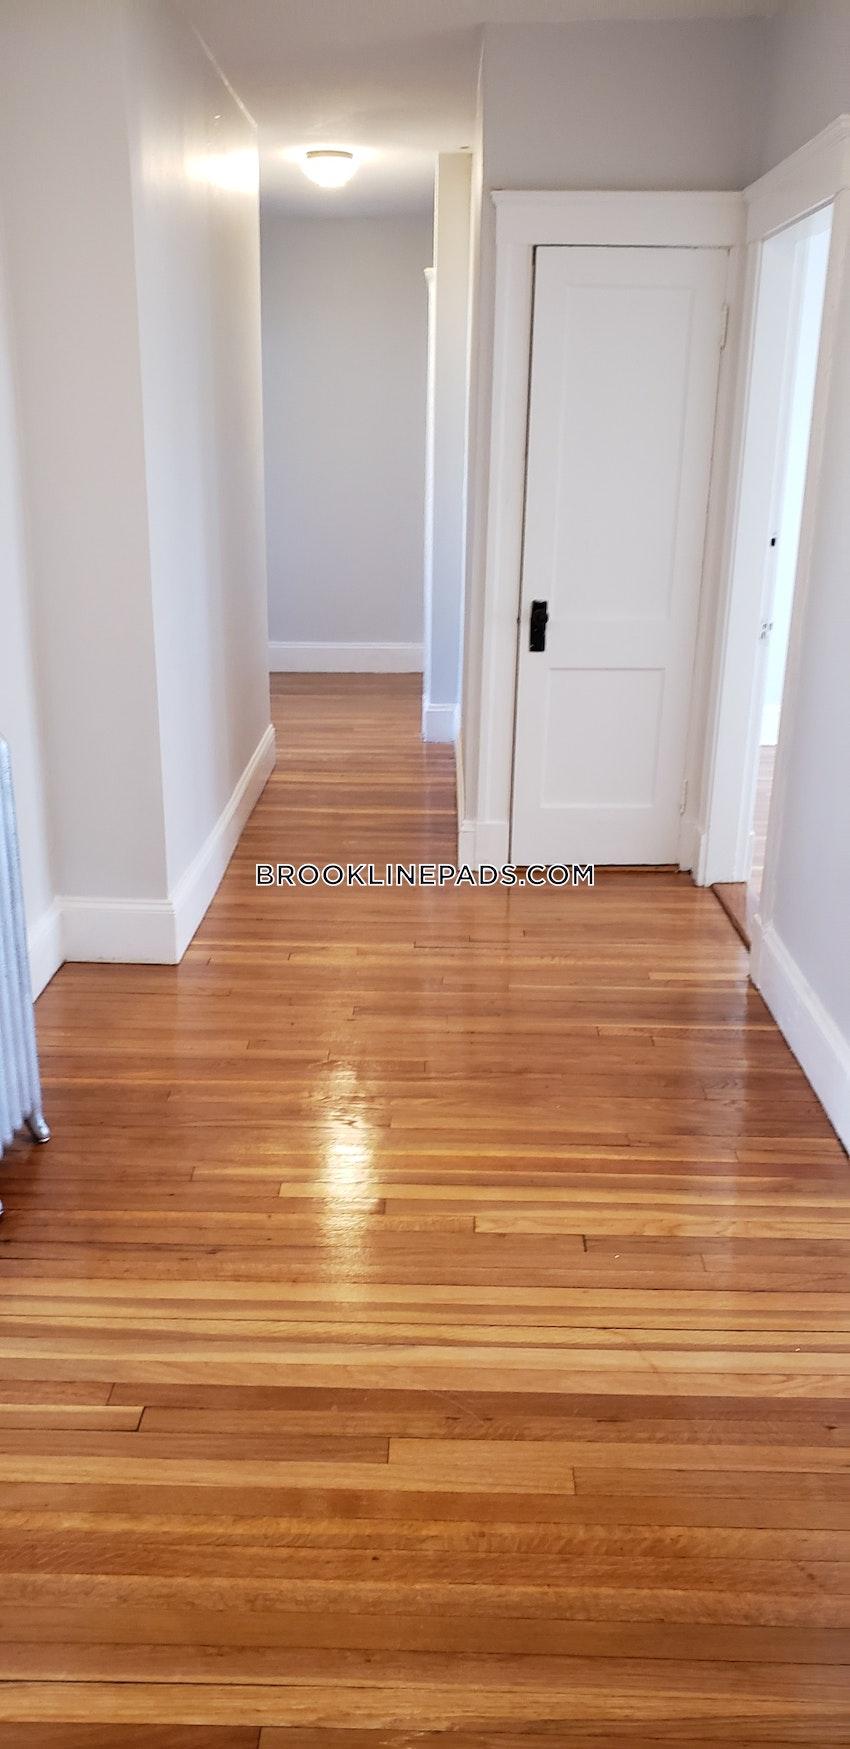 BROOKLINE- BOSTON UNIVERSITY - 4 Beds, 1.5 Baths - Image 18